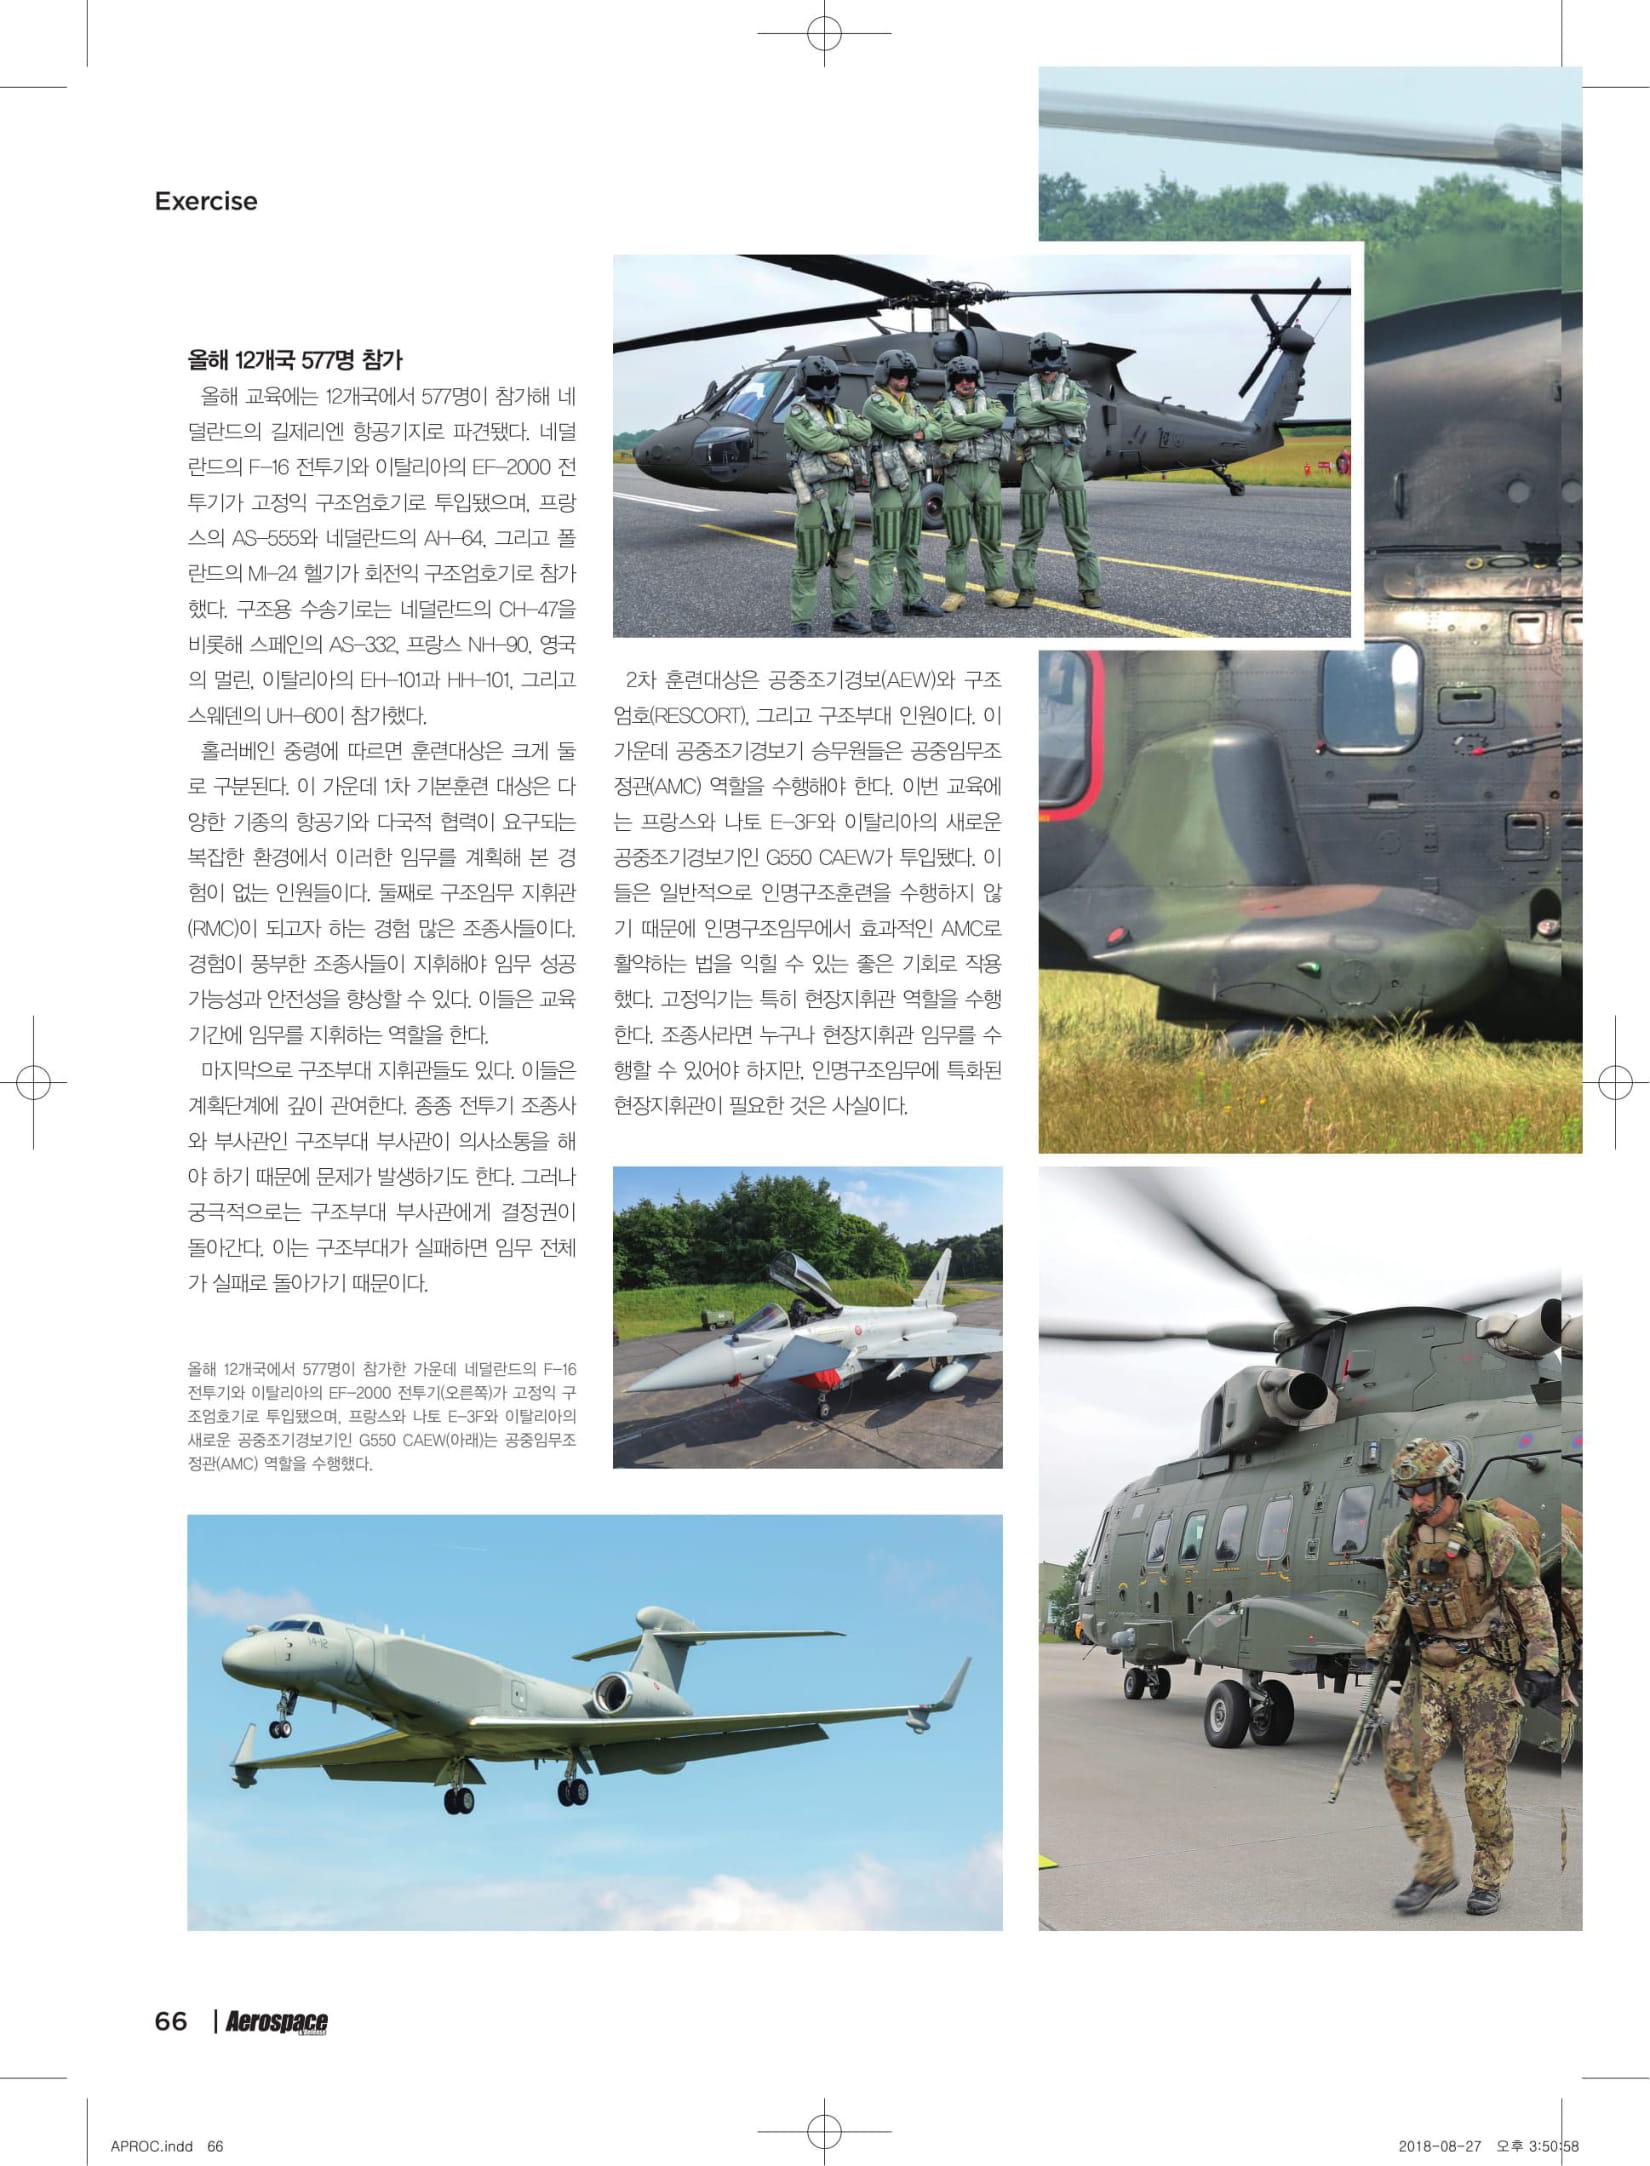 Aerospace & Defense (Korea)_APROC 2018-08